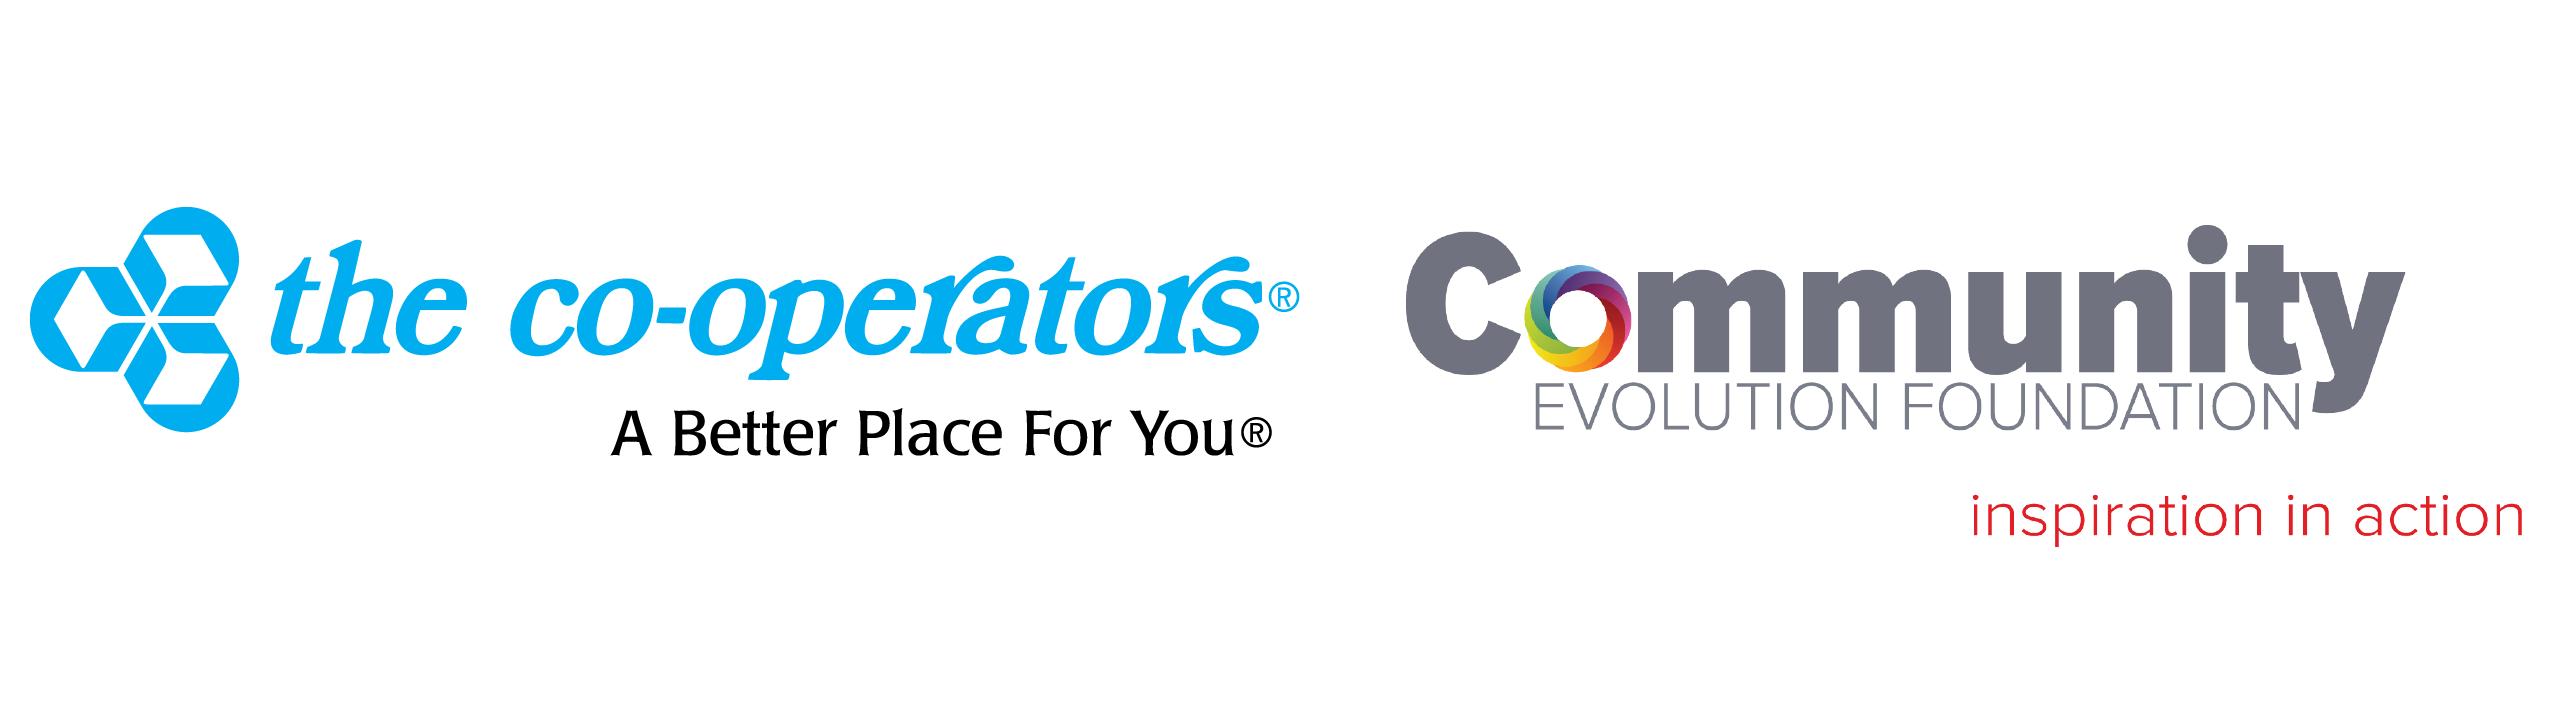 BCCA Co-op Week Innovation Forum Event Sponsors (The Co-operators, Community Evolution Fund)